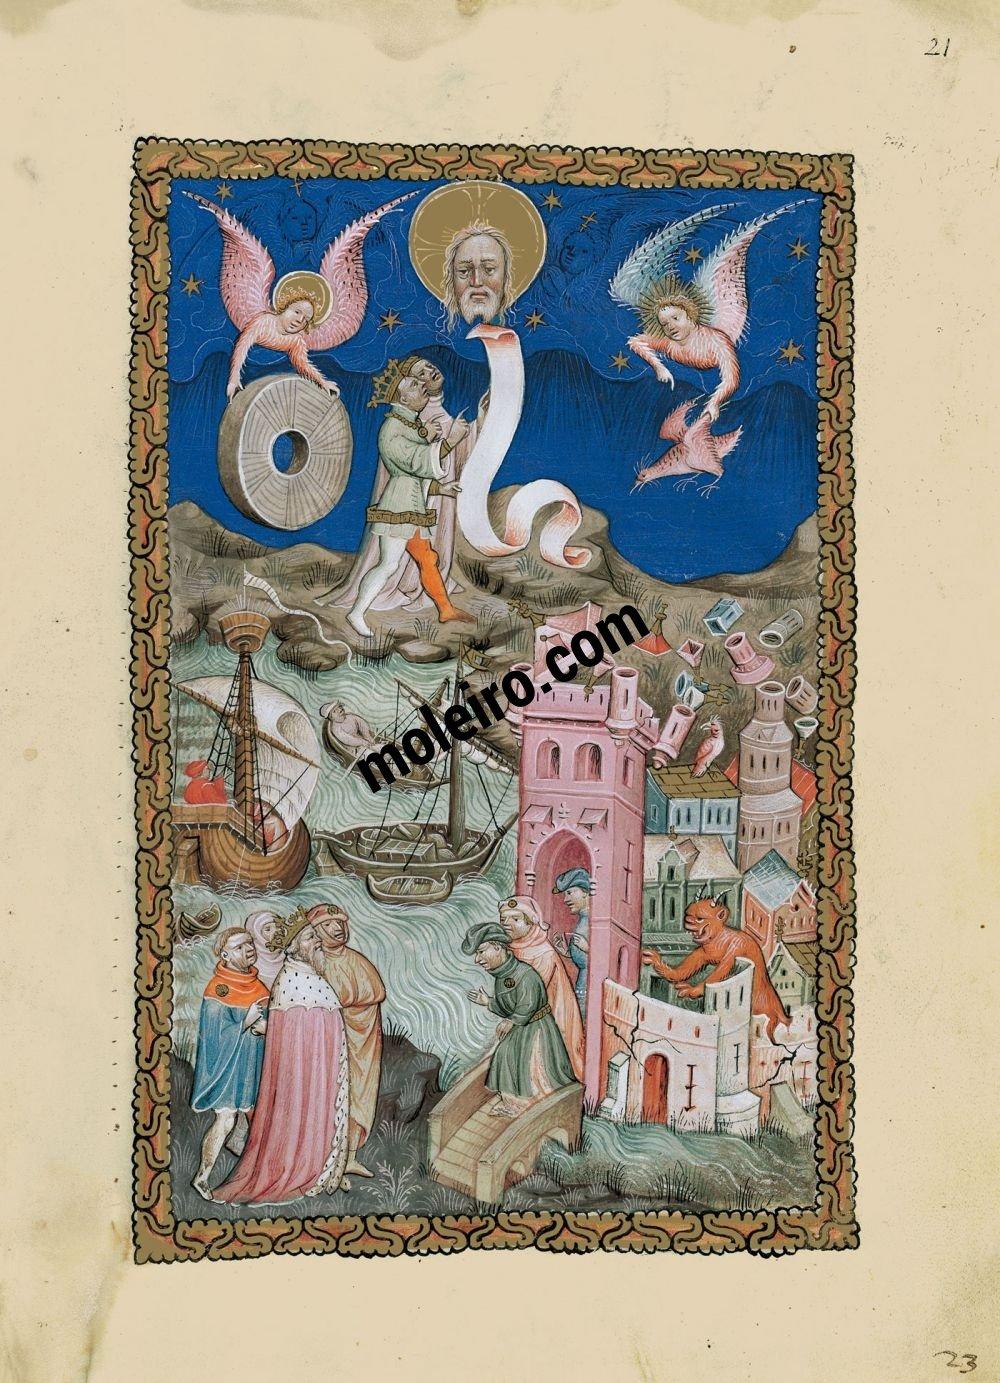 Apocalypse Flamande f. 21r L'effondrement de Babylone